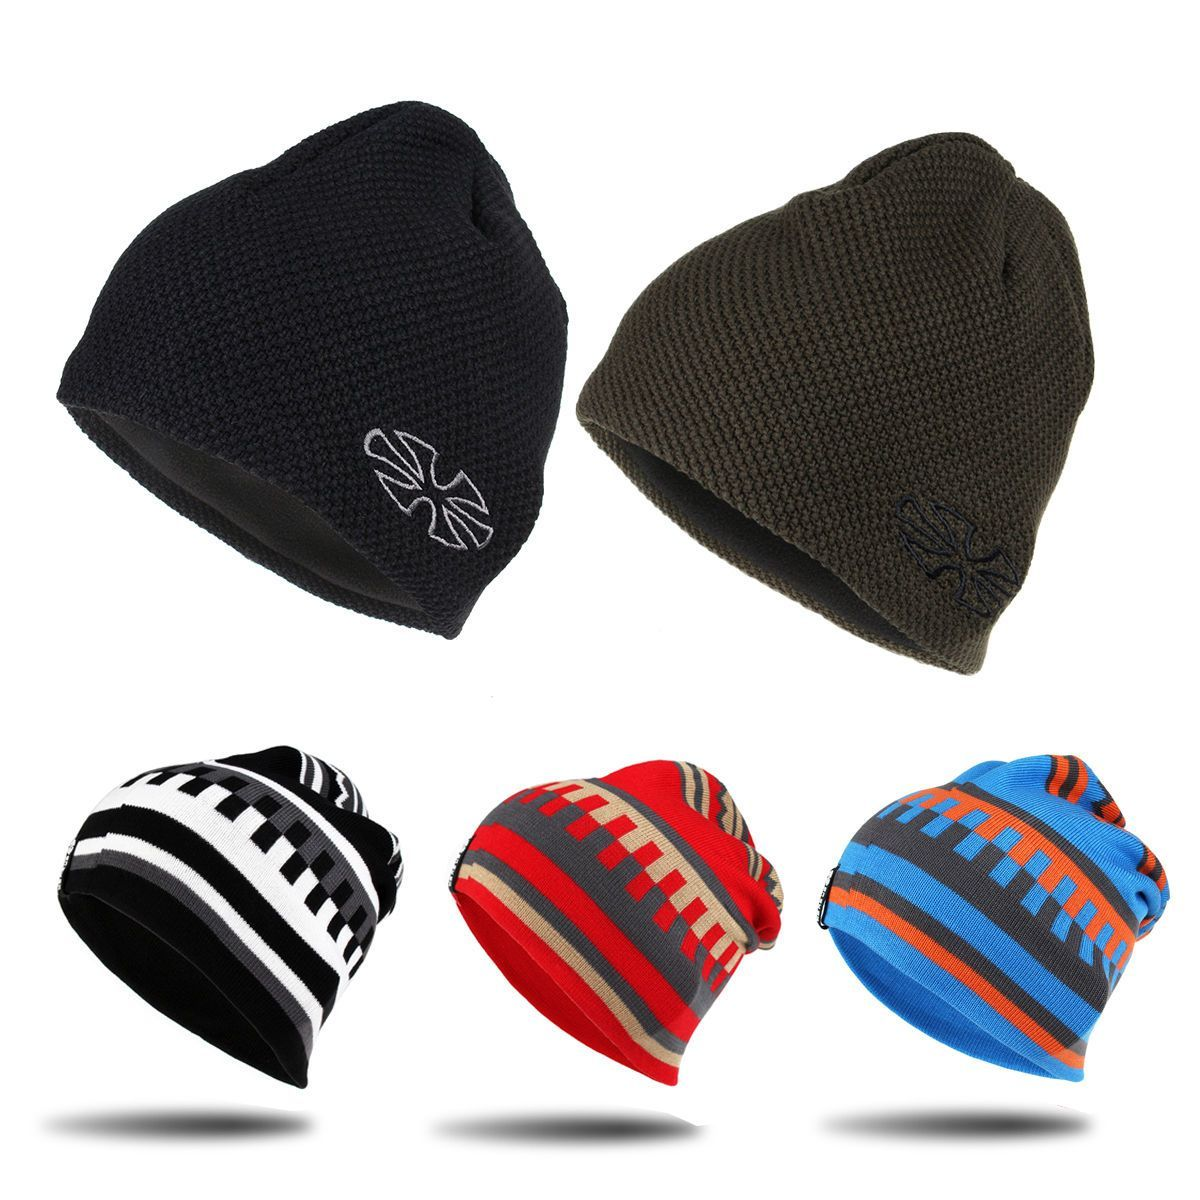 Unisex Knit Baggy Beanie Baggy Winter Hat Ski Crochet Slouchy ...